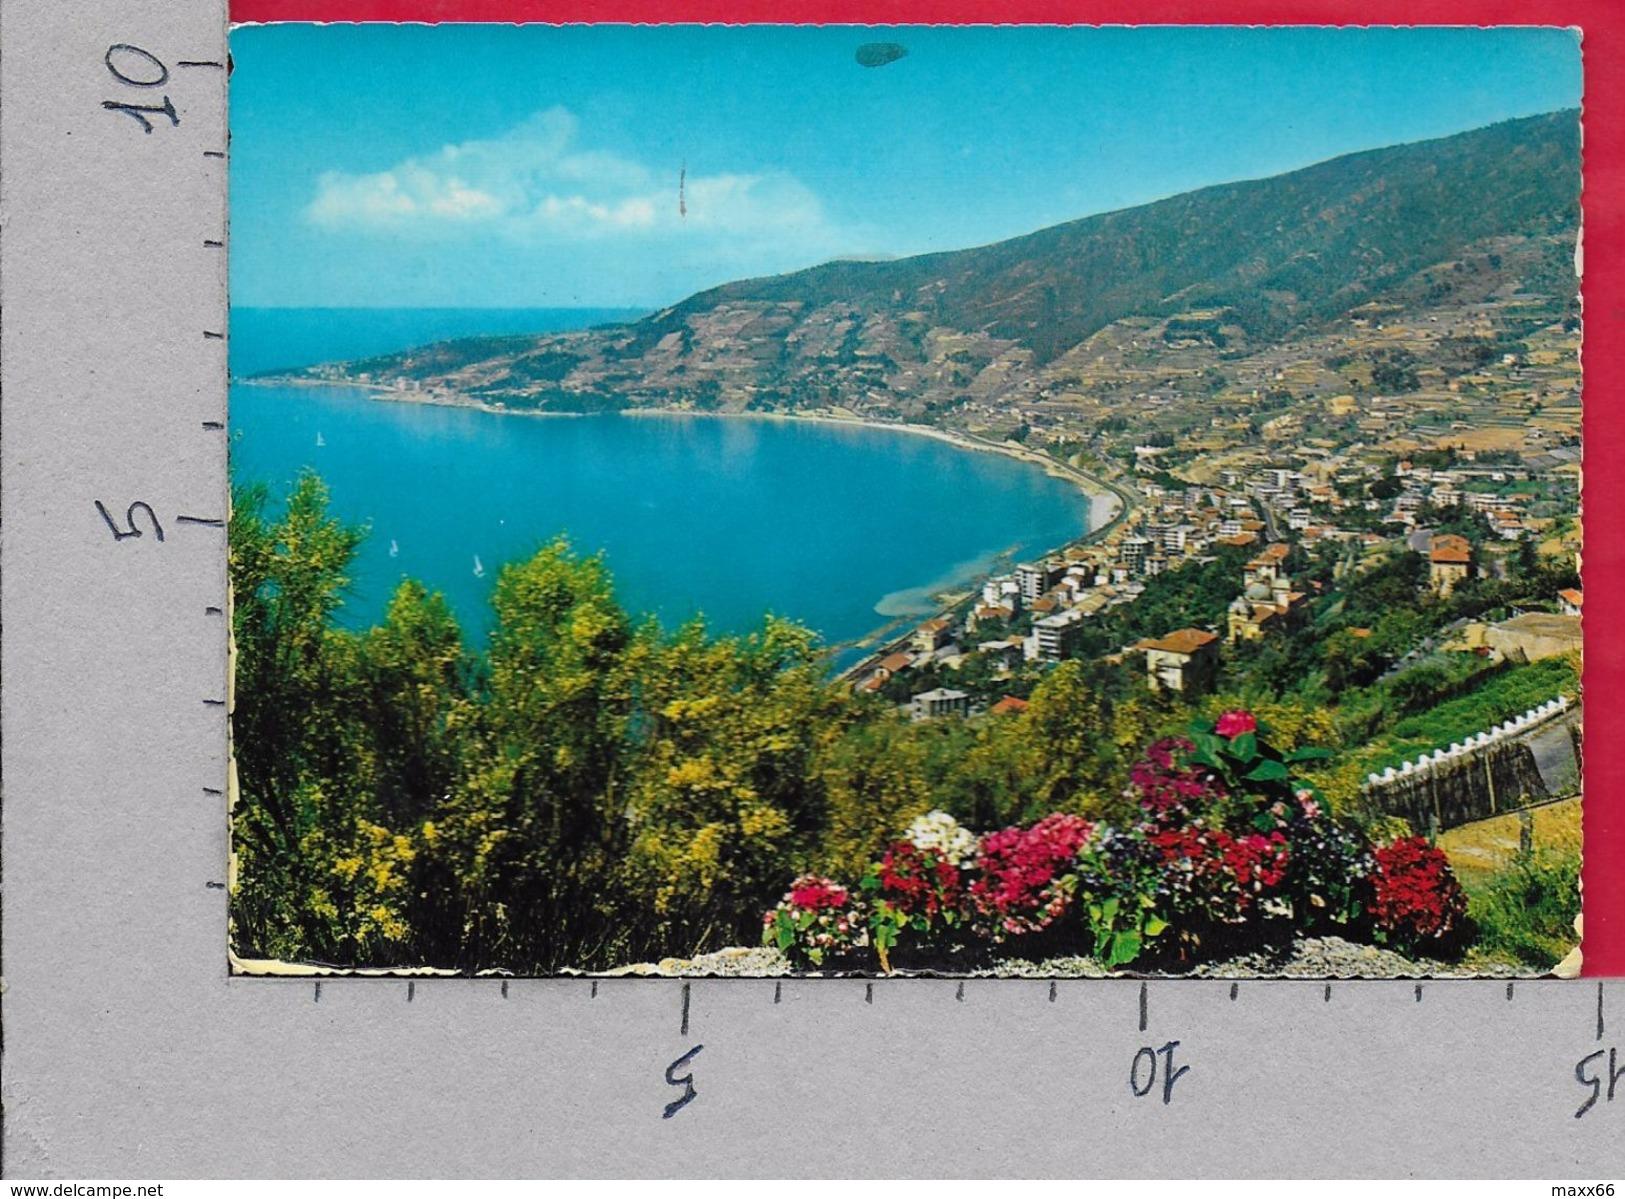 CARTOLINA VG ITALIA - OSPEDALETTI (IM) - Panorama Da Levante - 10 X 15 - ANN. 1970 - Imperia